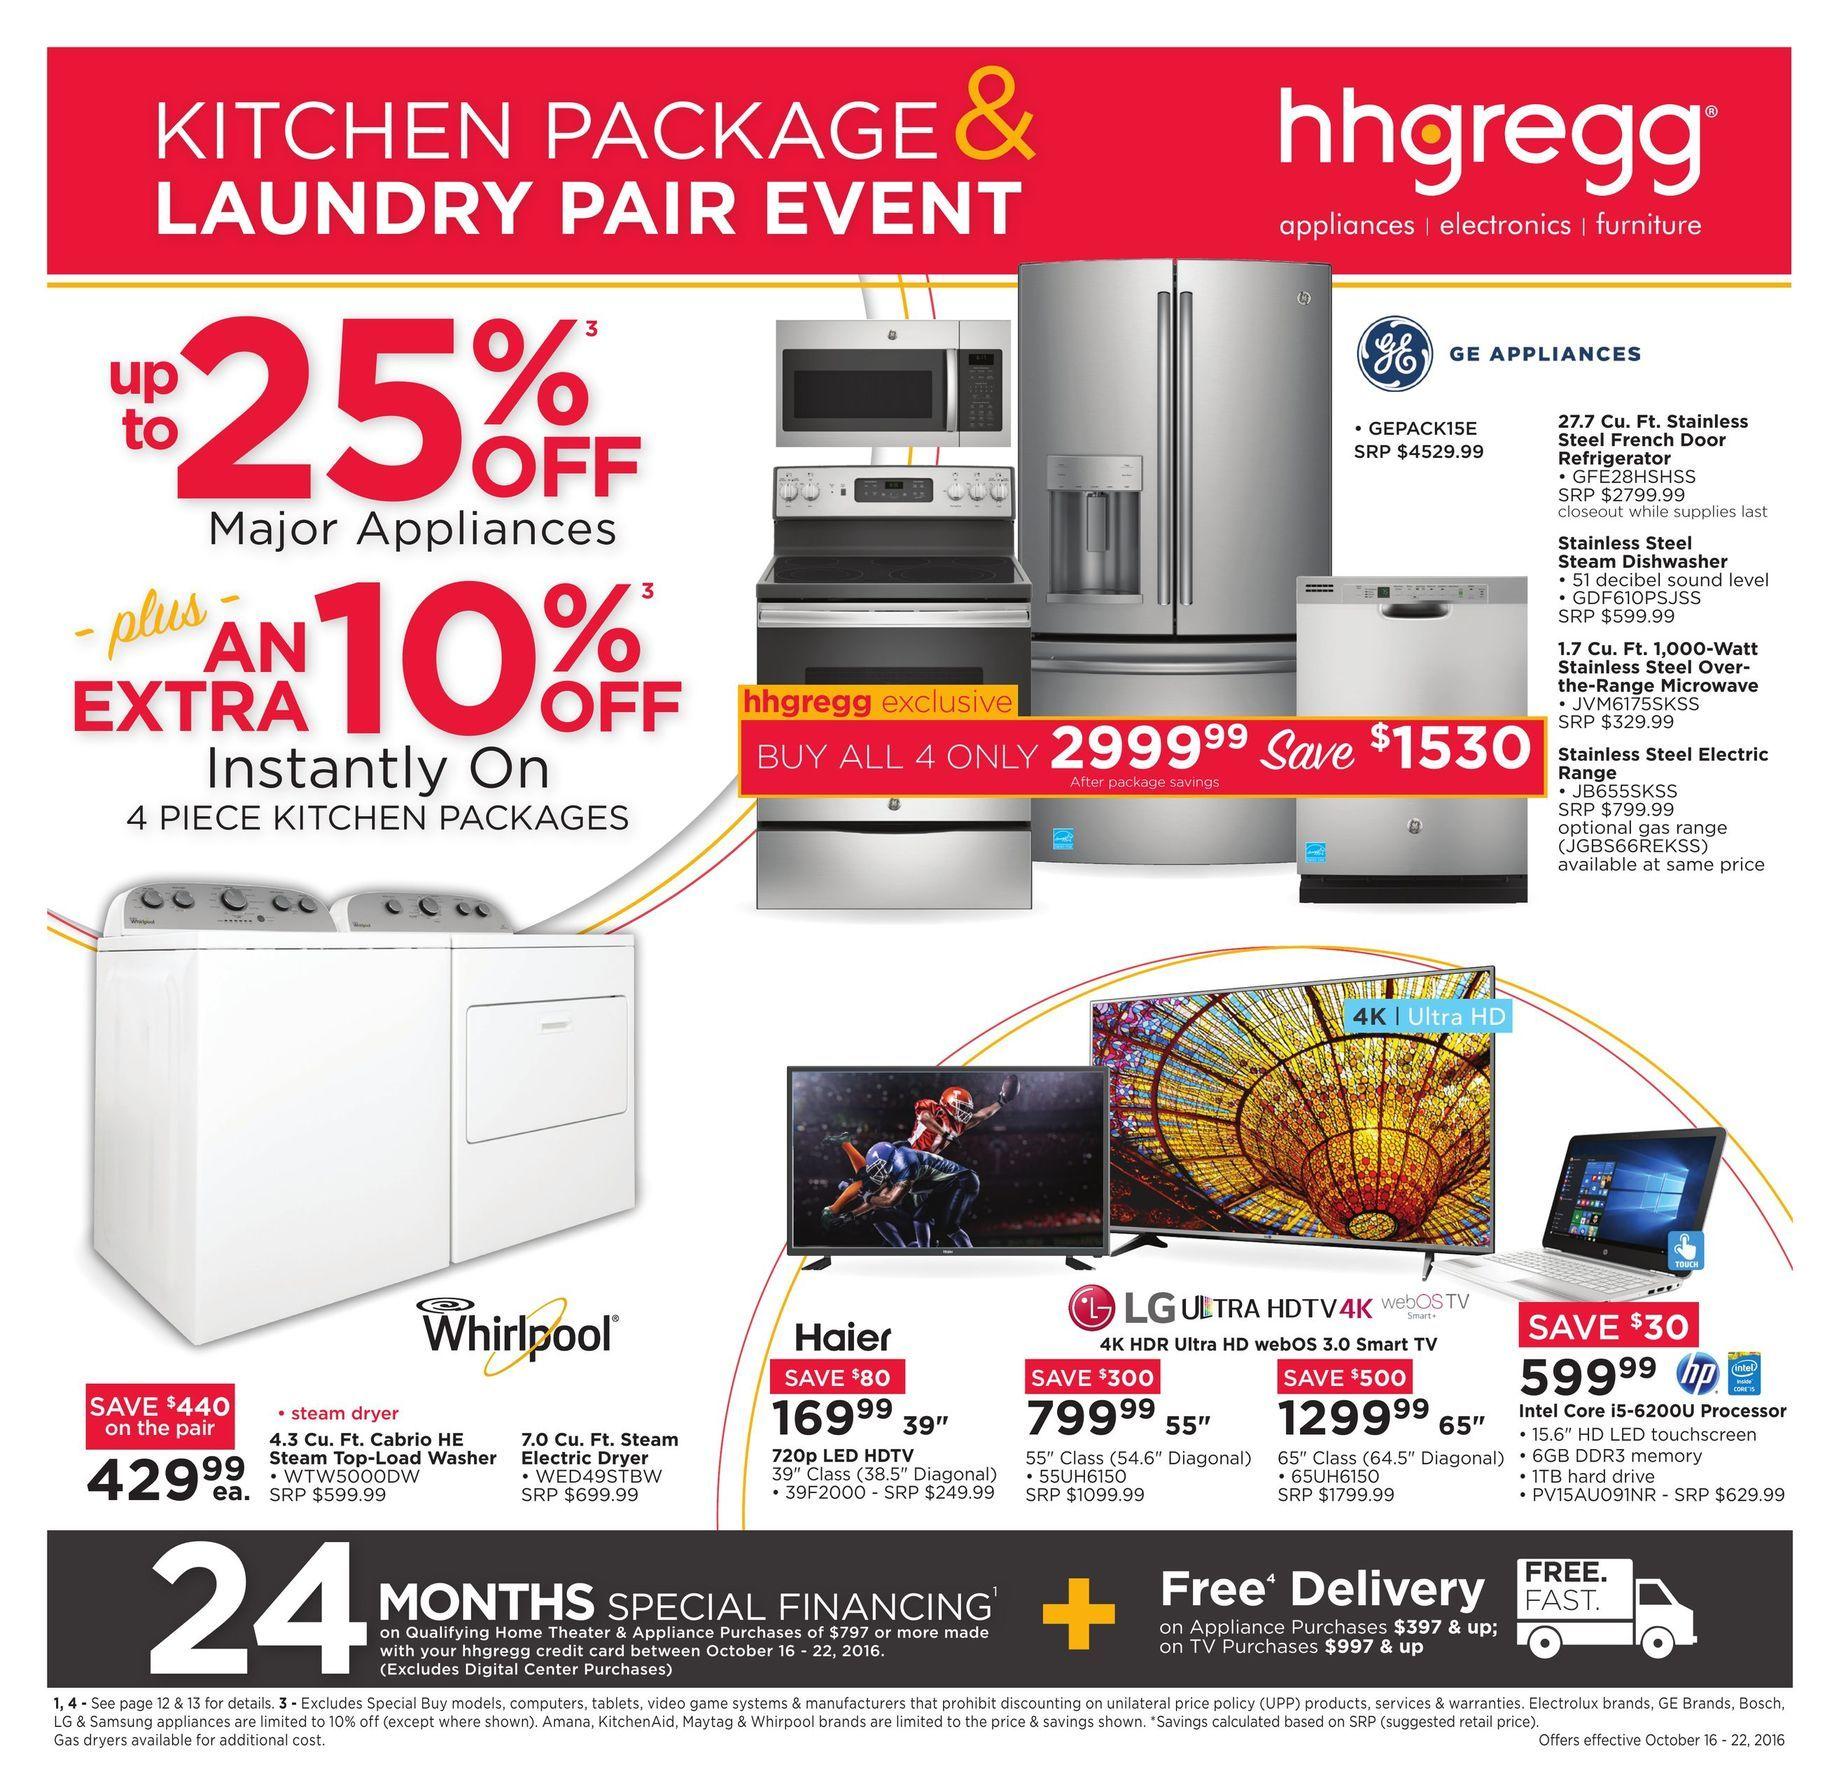 hhgregg Weekly Ad Appliances - http://www.istoreads.com/hhgregg ...